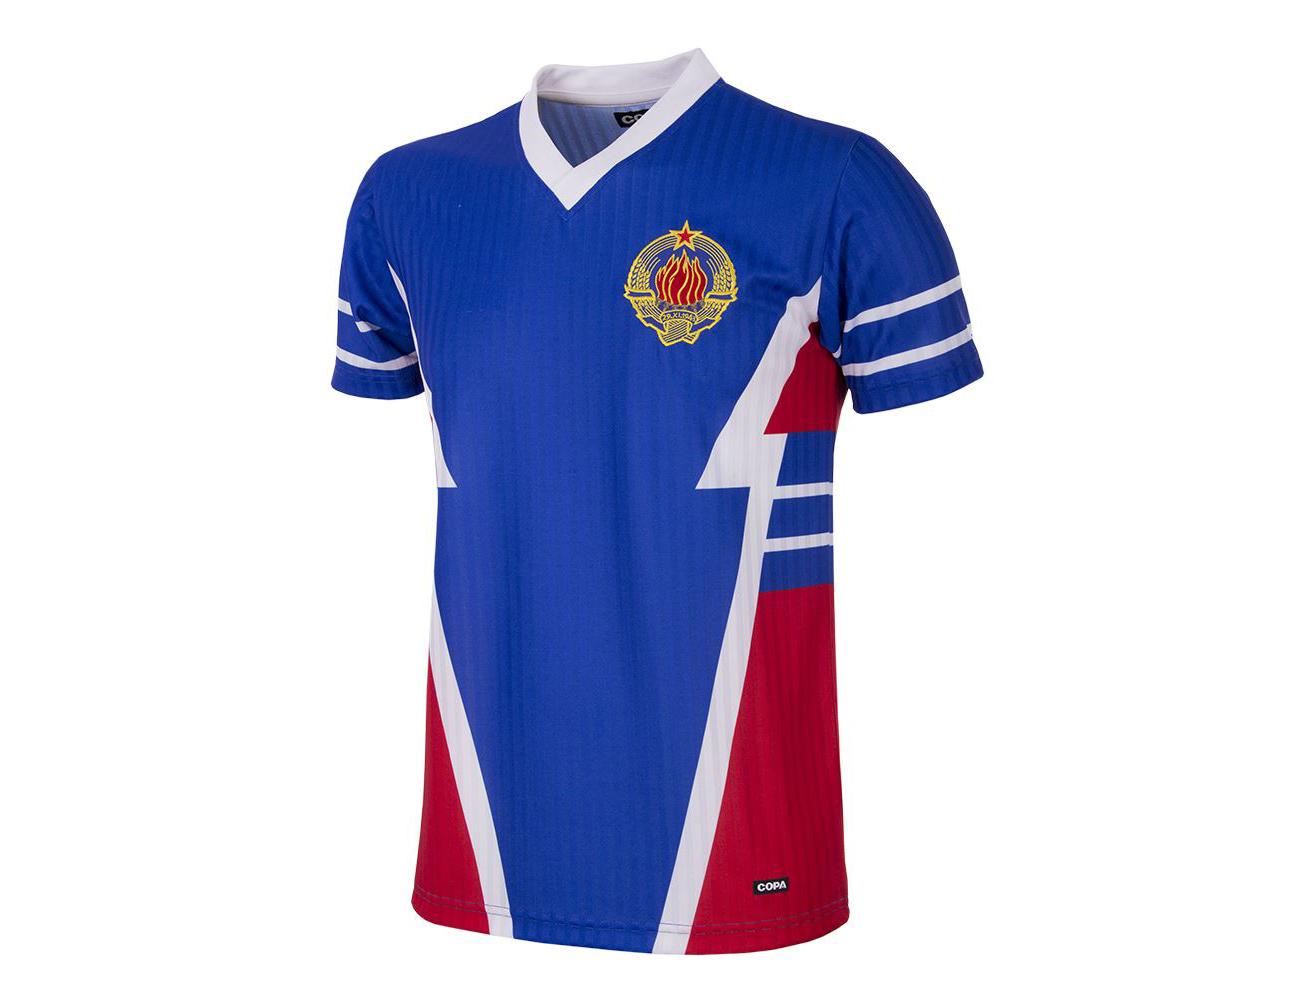 Yugoslavia-1990-Short-Sleeve-Retro-Football-Shirt-blu-4144